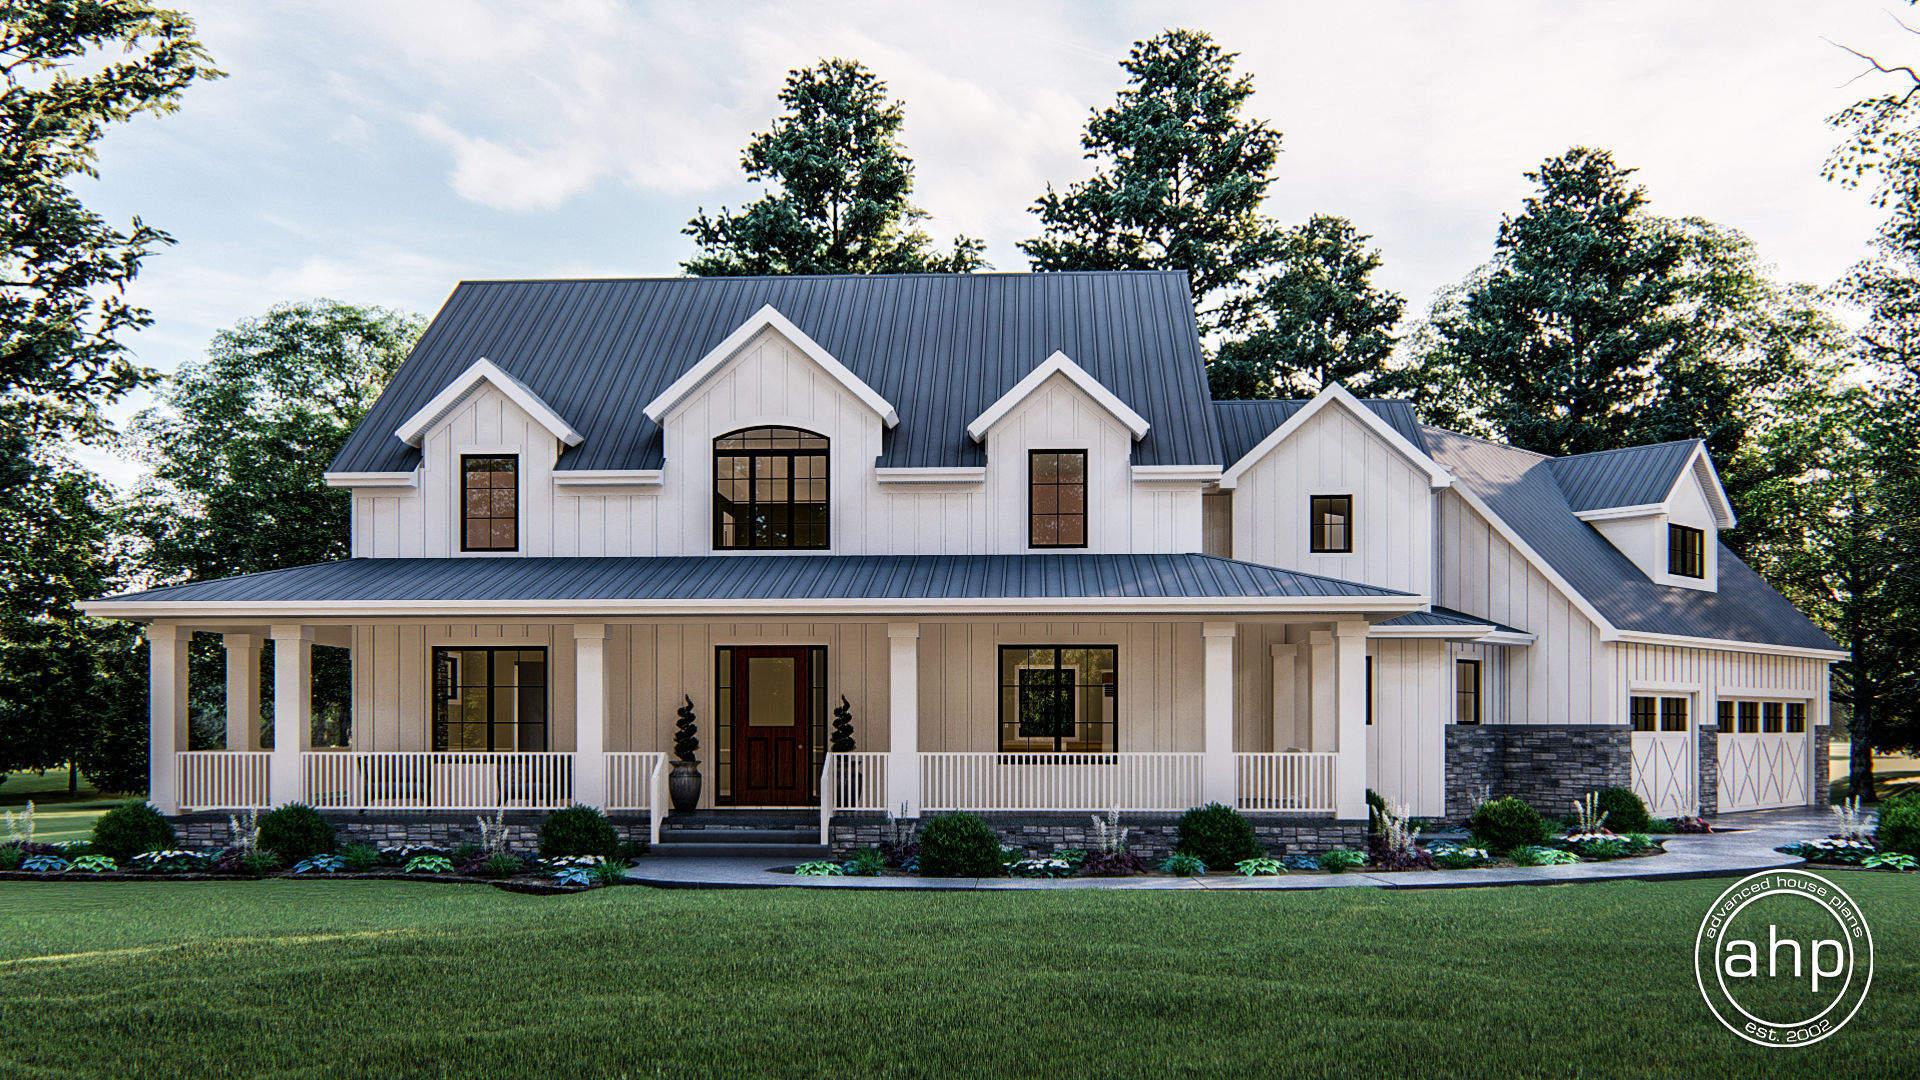 2 Story Modern Farmhouse House Plan | Melrose